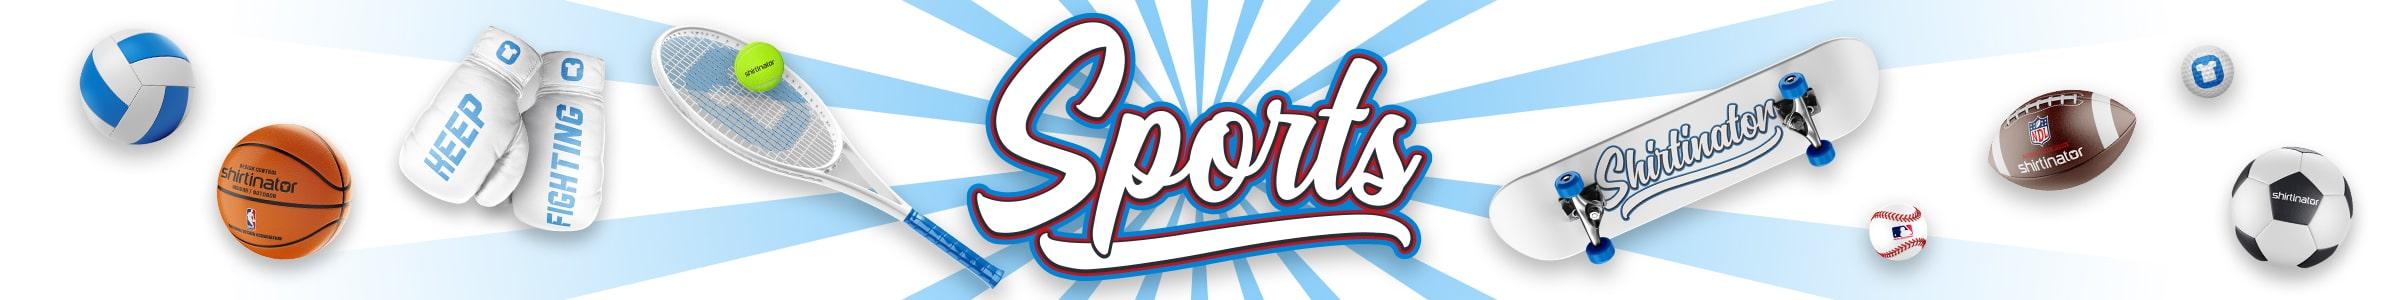 Category_Teaser_Header_Sports_2400x300